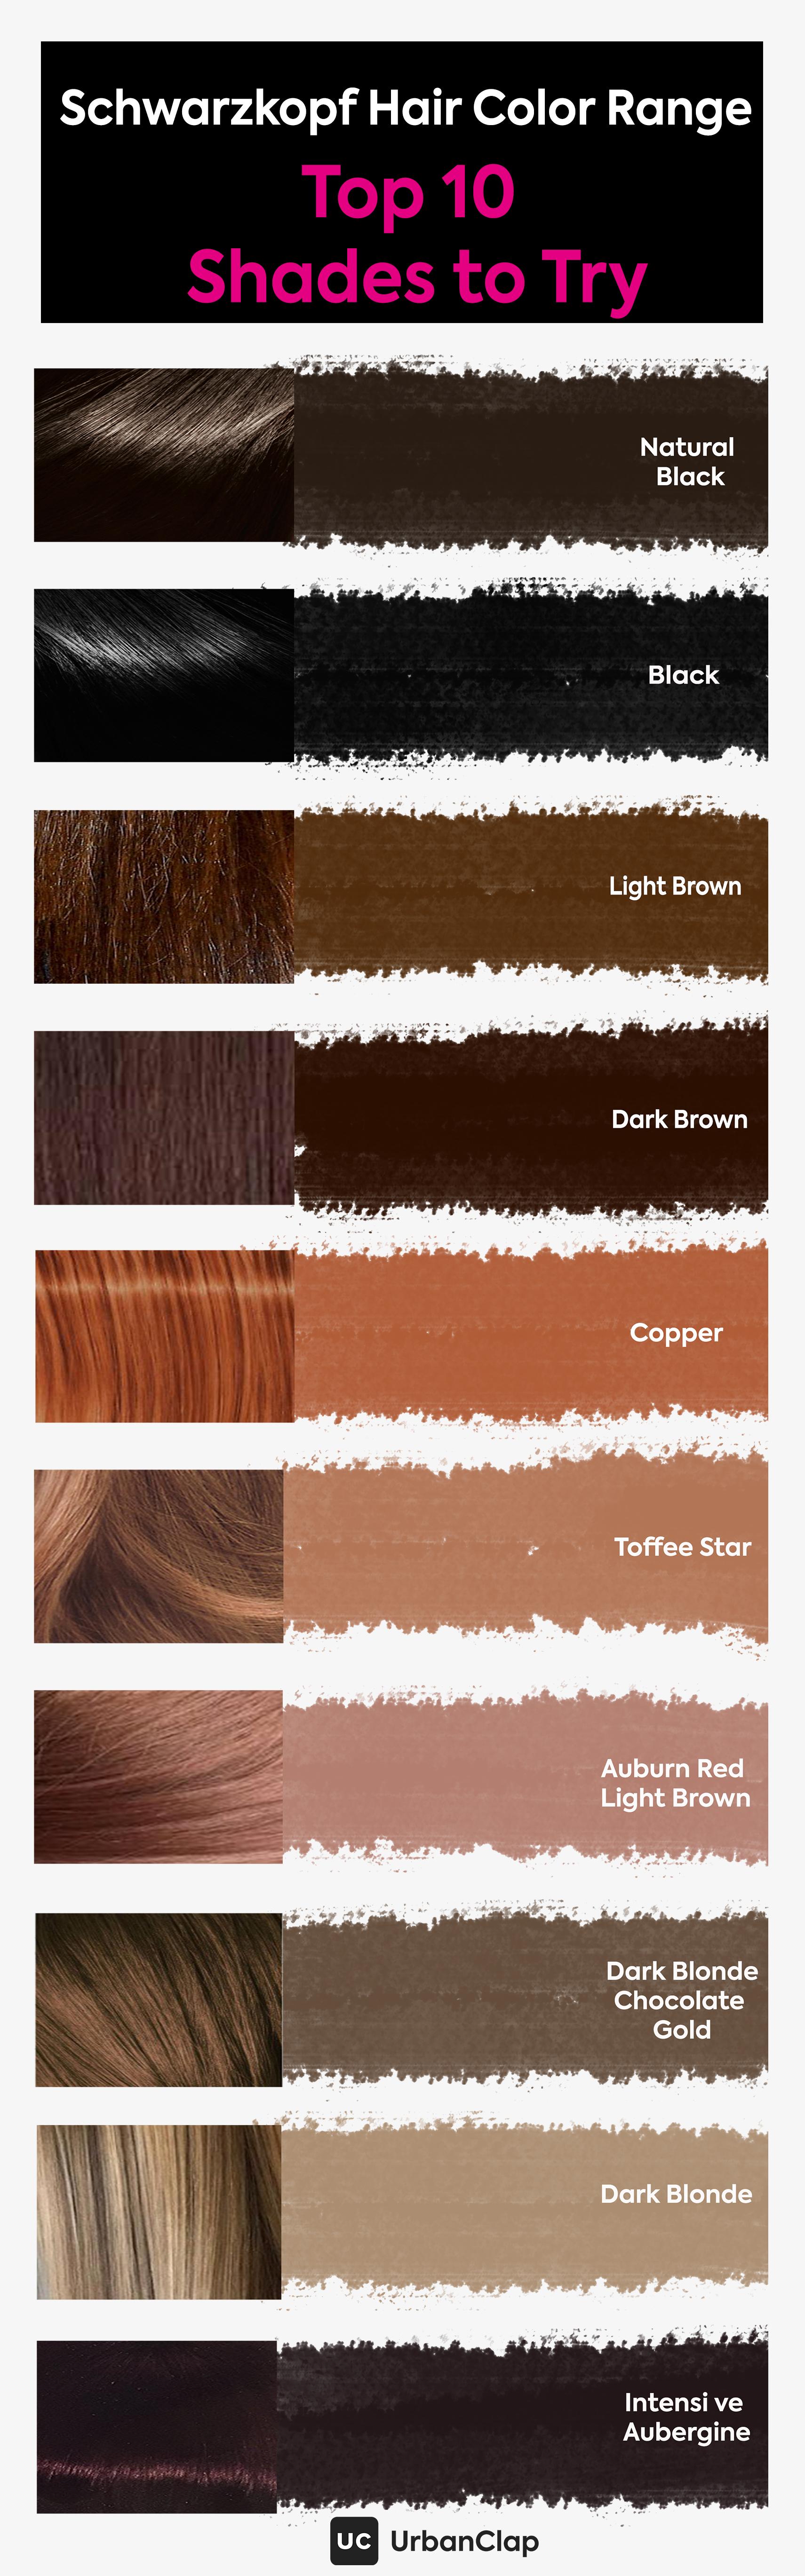 Schwarzkopf Hair Color Range Top 10 Shades For Indian Skin